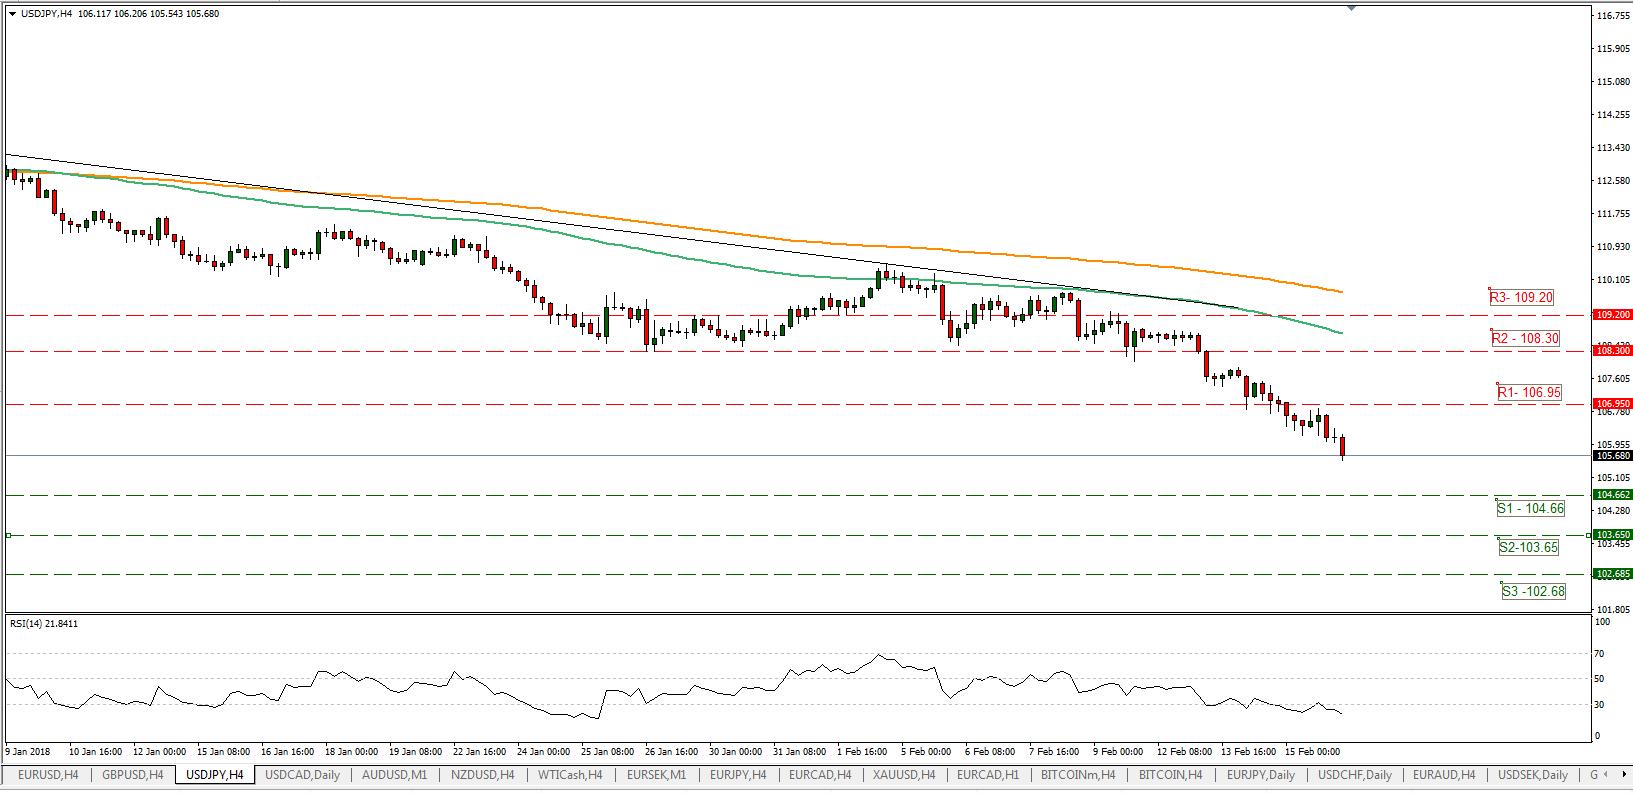 USD/JPY 16/02/2018 | EconAlerts